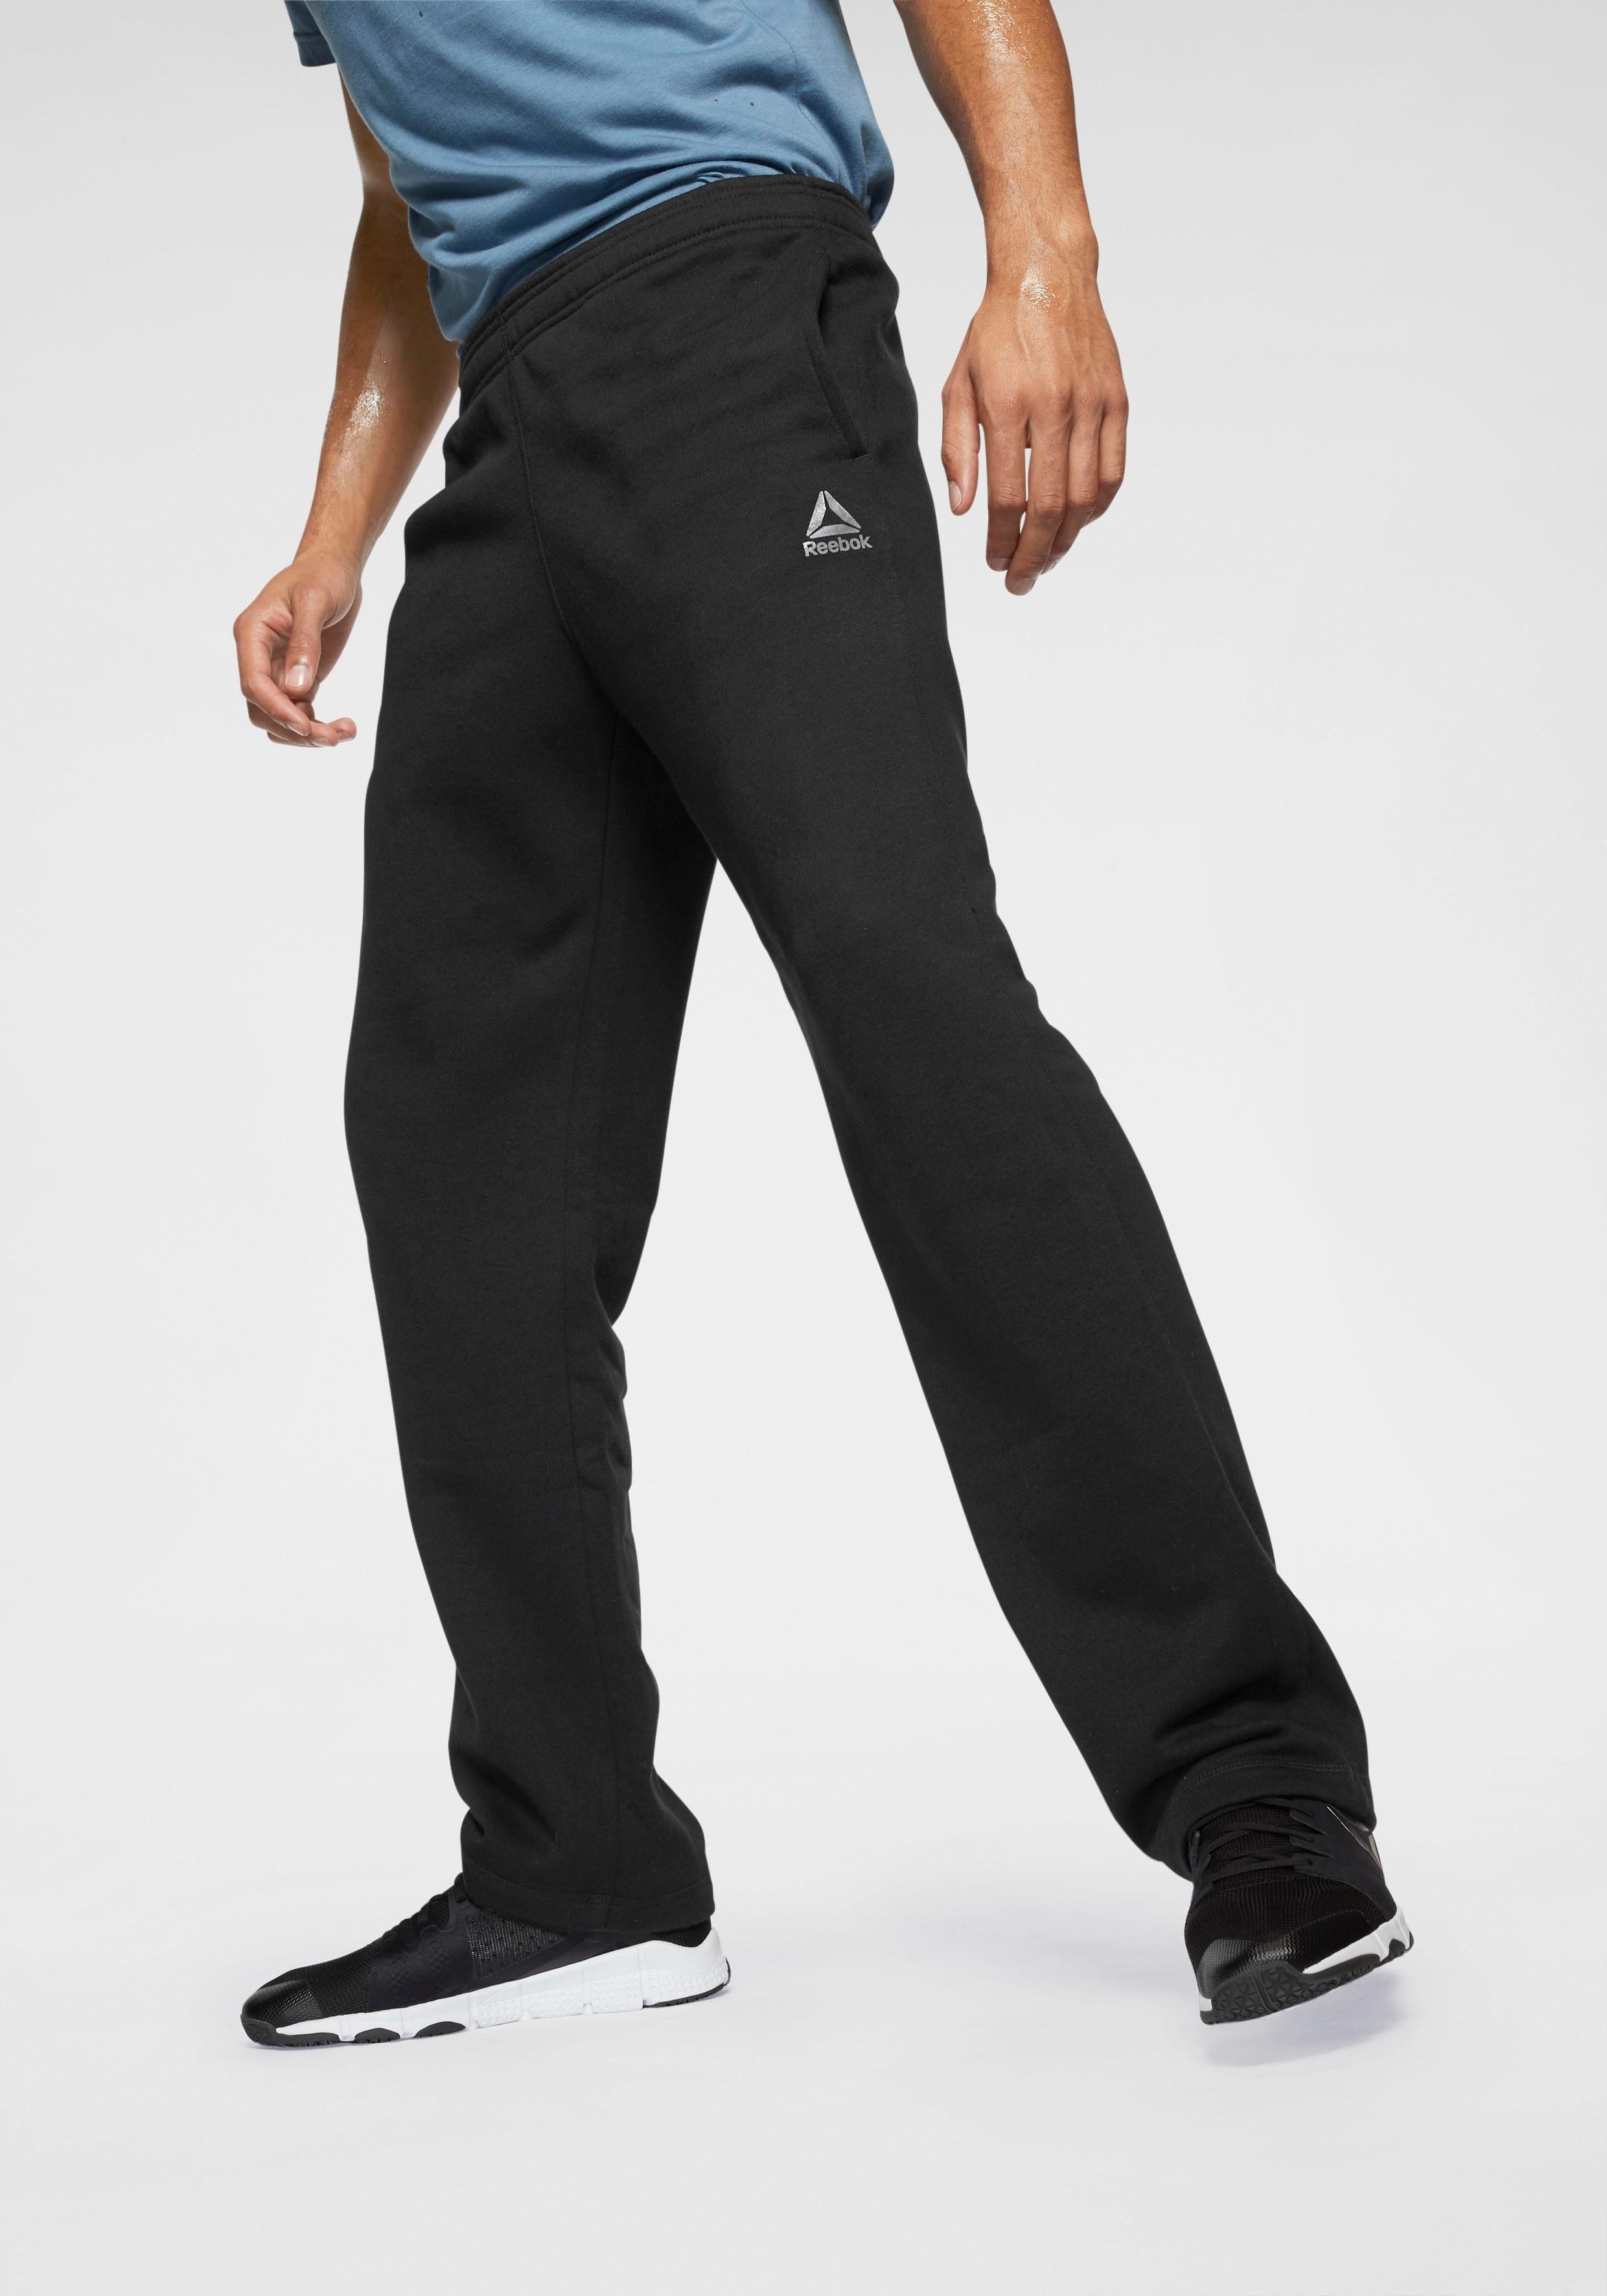 Reebok Sporthose »EL FLEECE OH PANT« online kaufen | OTTO